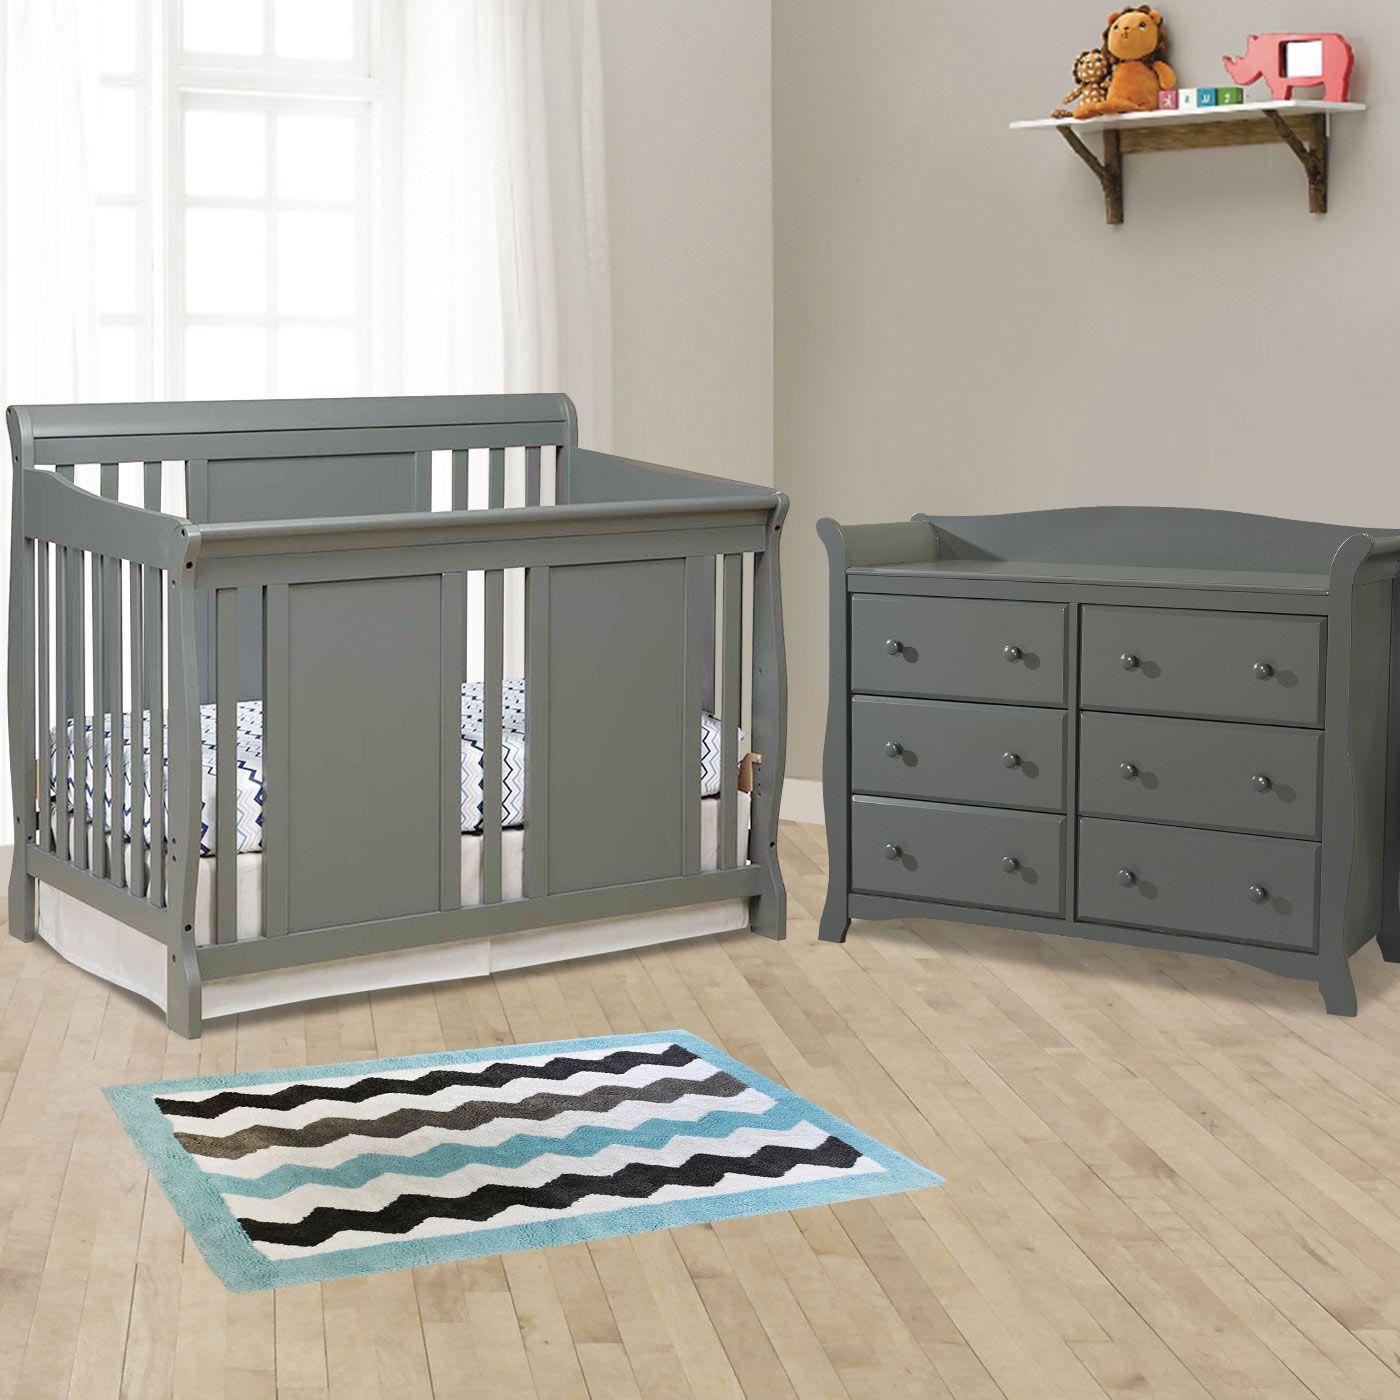 storkcraft 2 piece nursery set verona convertible crib and avalon 6 drawer double dresser in. Black Bedroom Furniture Sets. Home Design Ideas